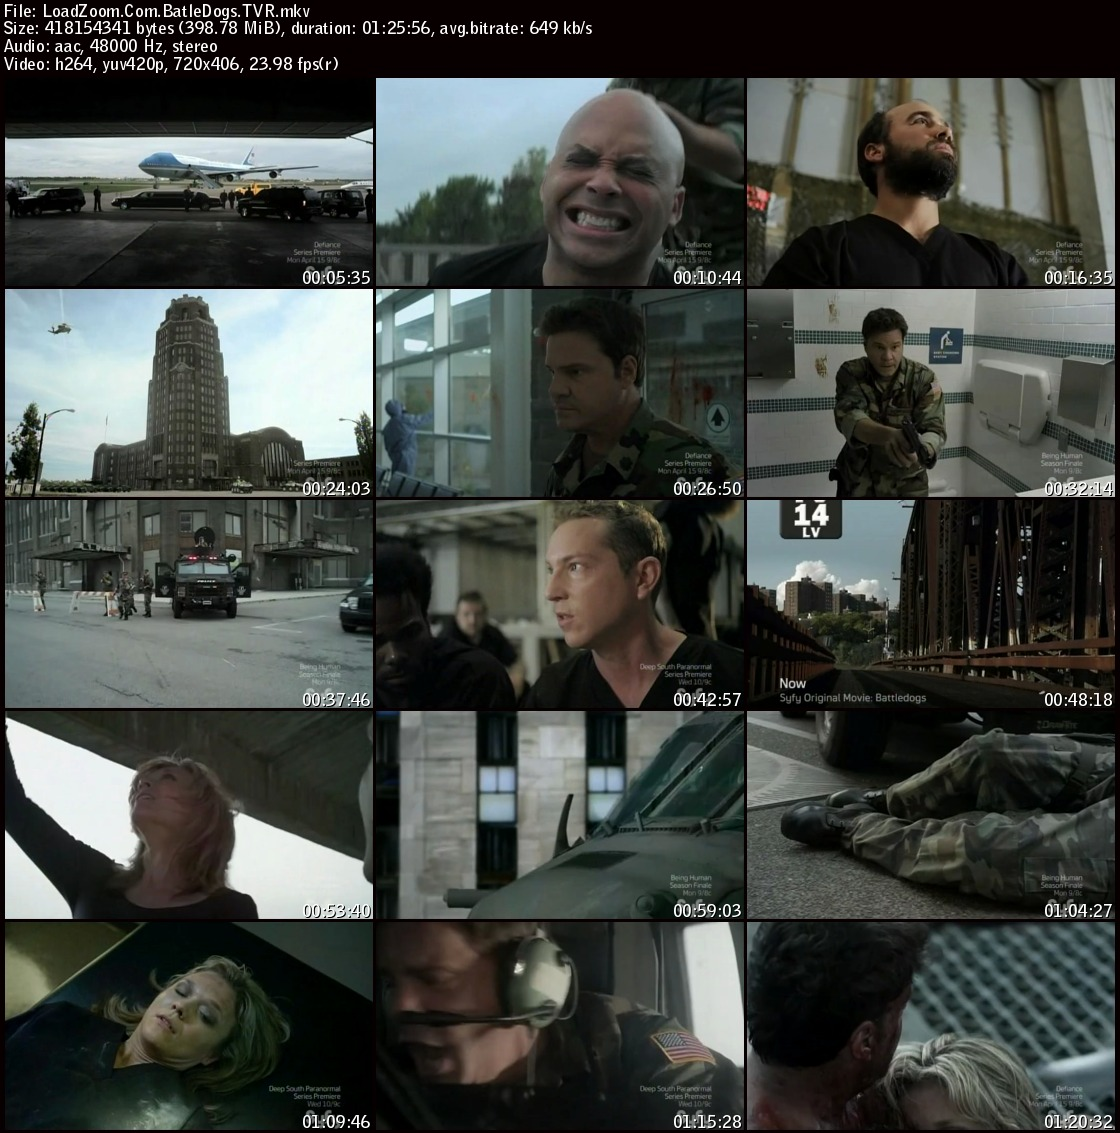 movie screenshot of battledogs fdmovie.com